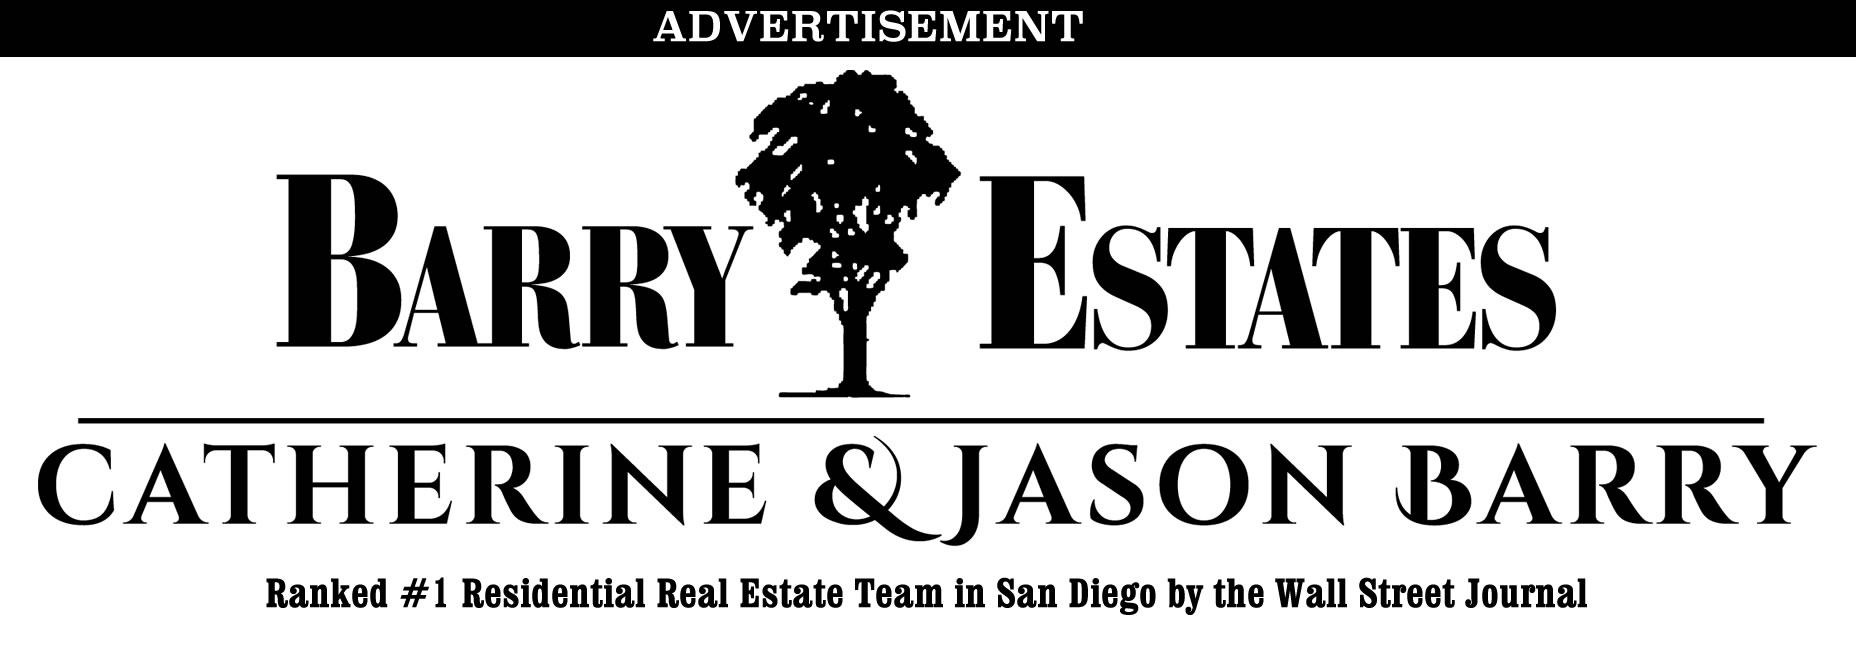 Barry Estates